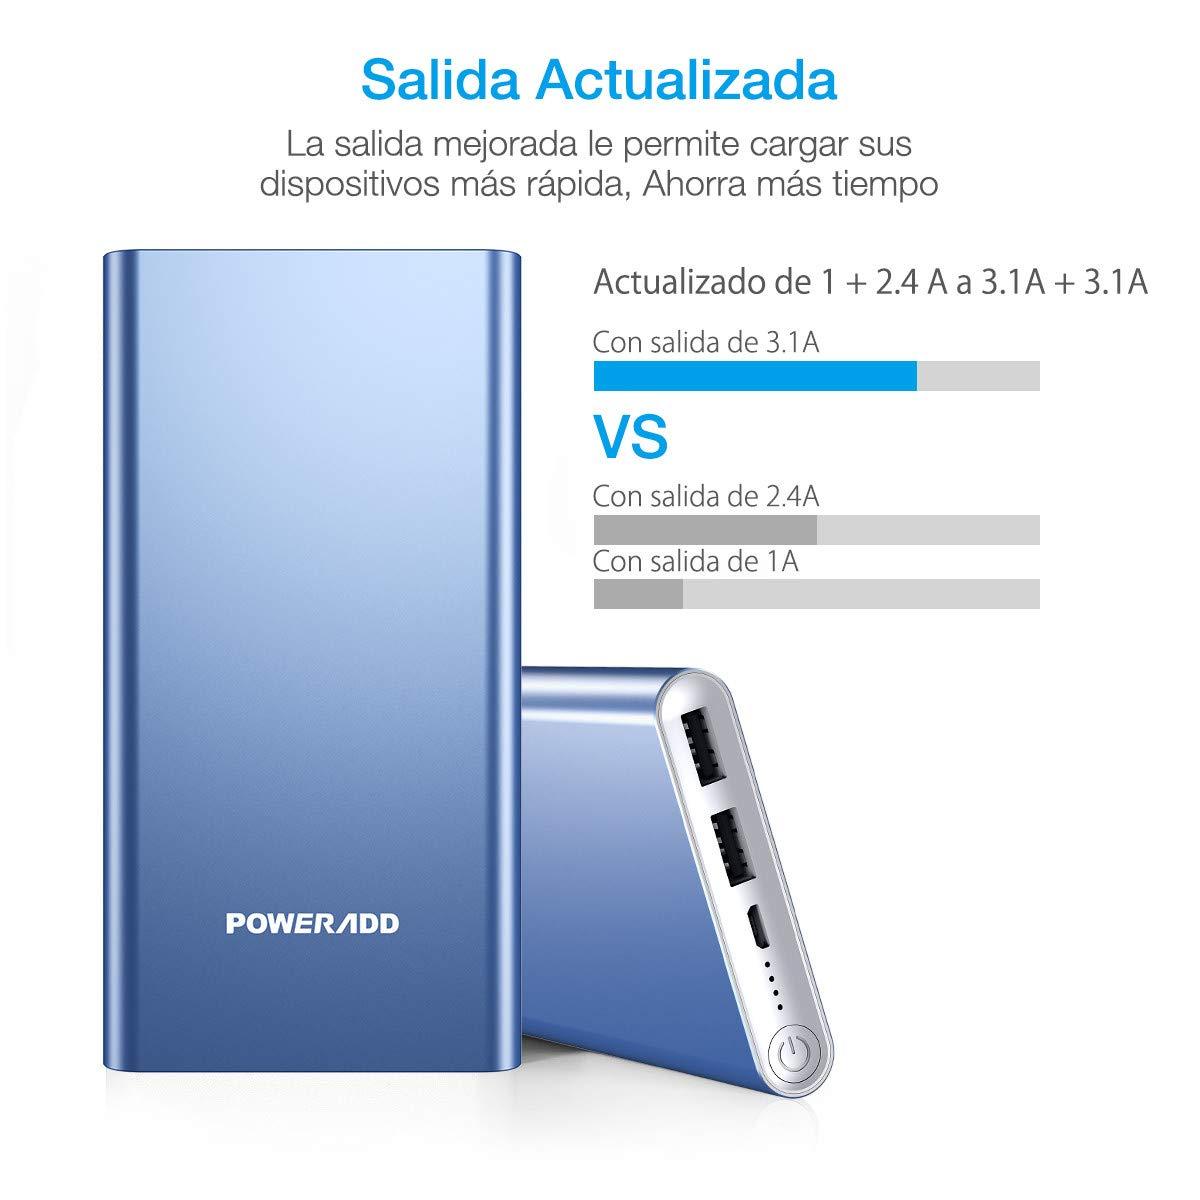 POWERADD Versi/ón Mejorada Pilot 2GS Power Bank 10000mAh Cargador Port/átil Bater/ía Externa para iPhone iPad Rojo Samsung y M/ás Huawei Doble Puerto de Salida, 3.1A+3.1A